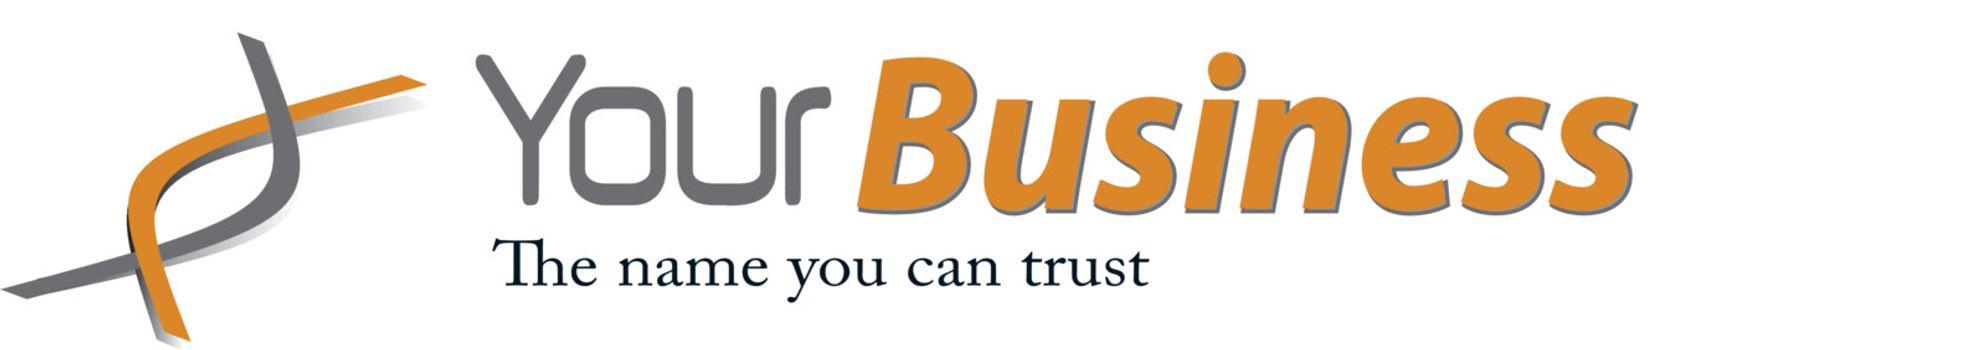 Business, corporation elegant logo, clean vector render.